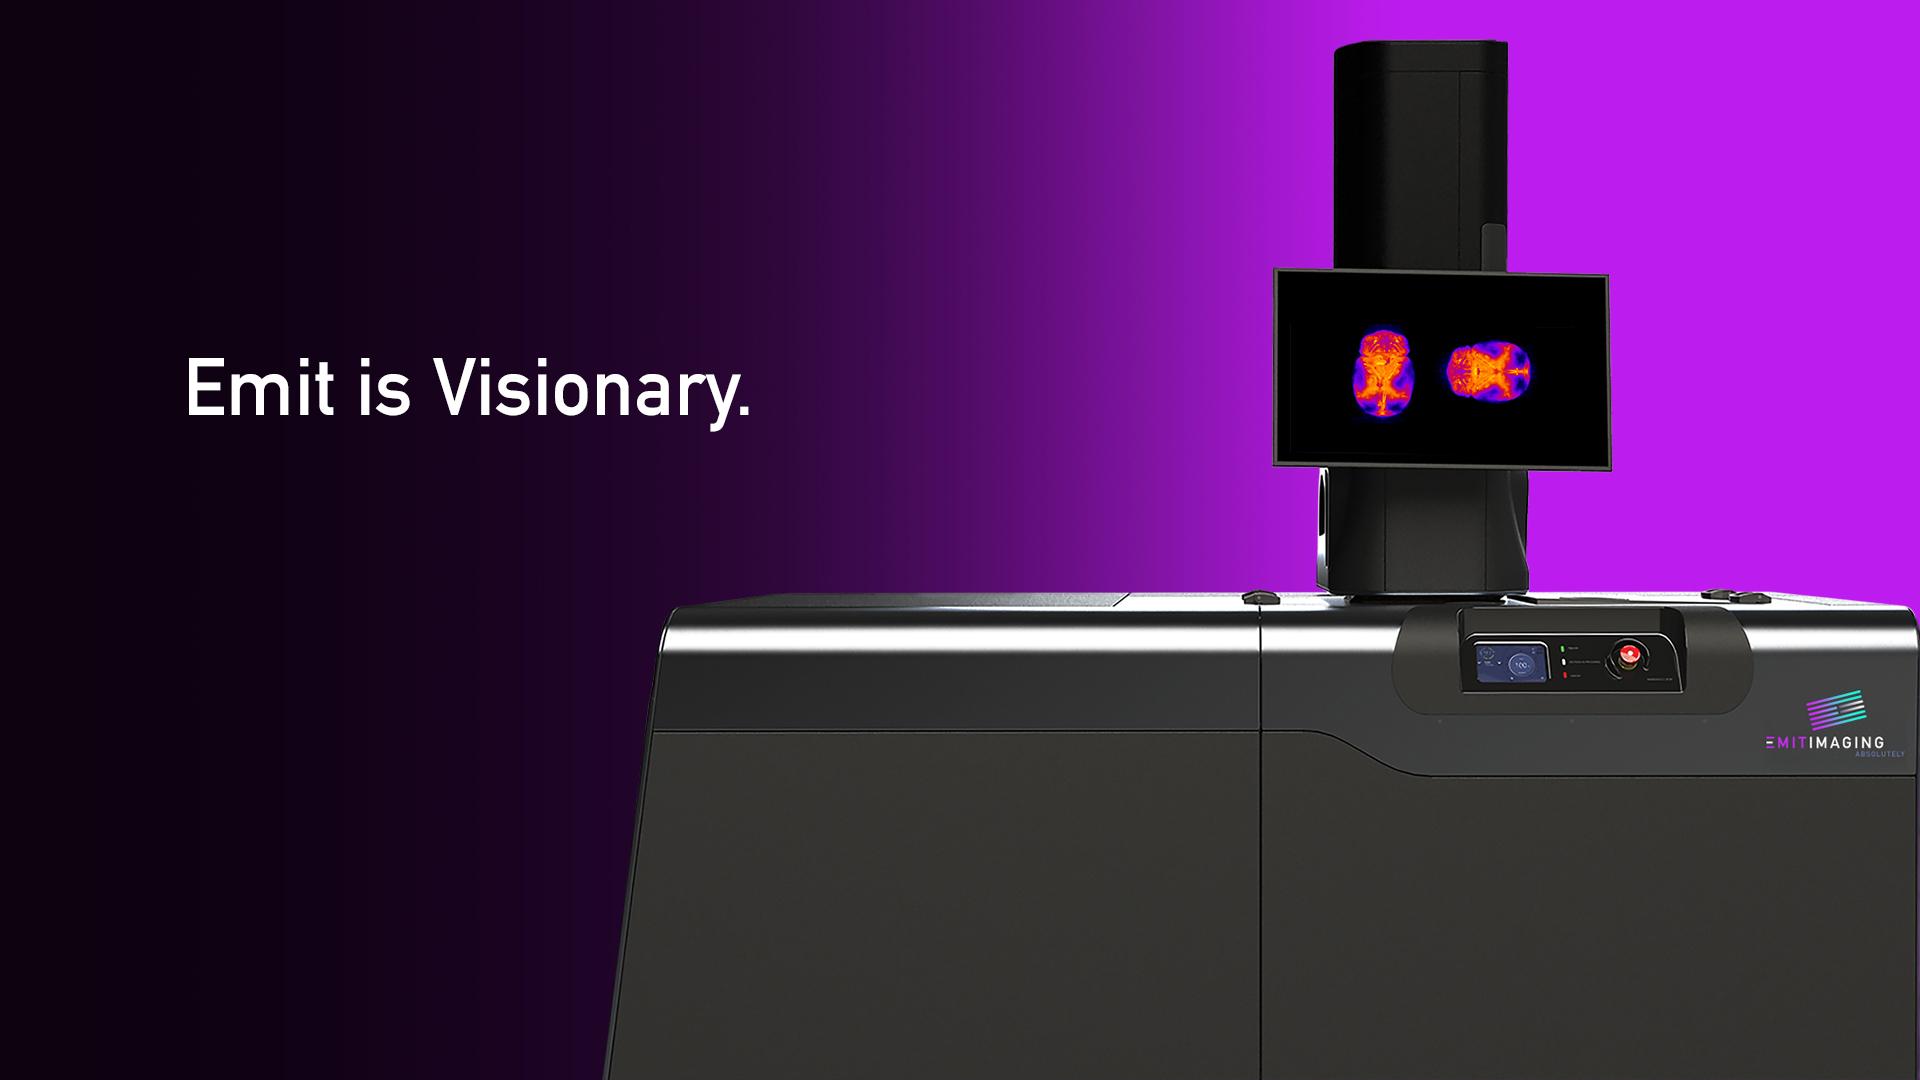 emit-values-visionary